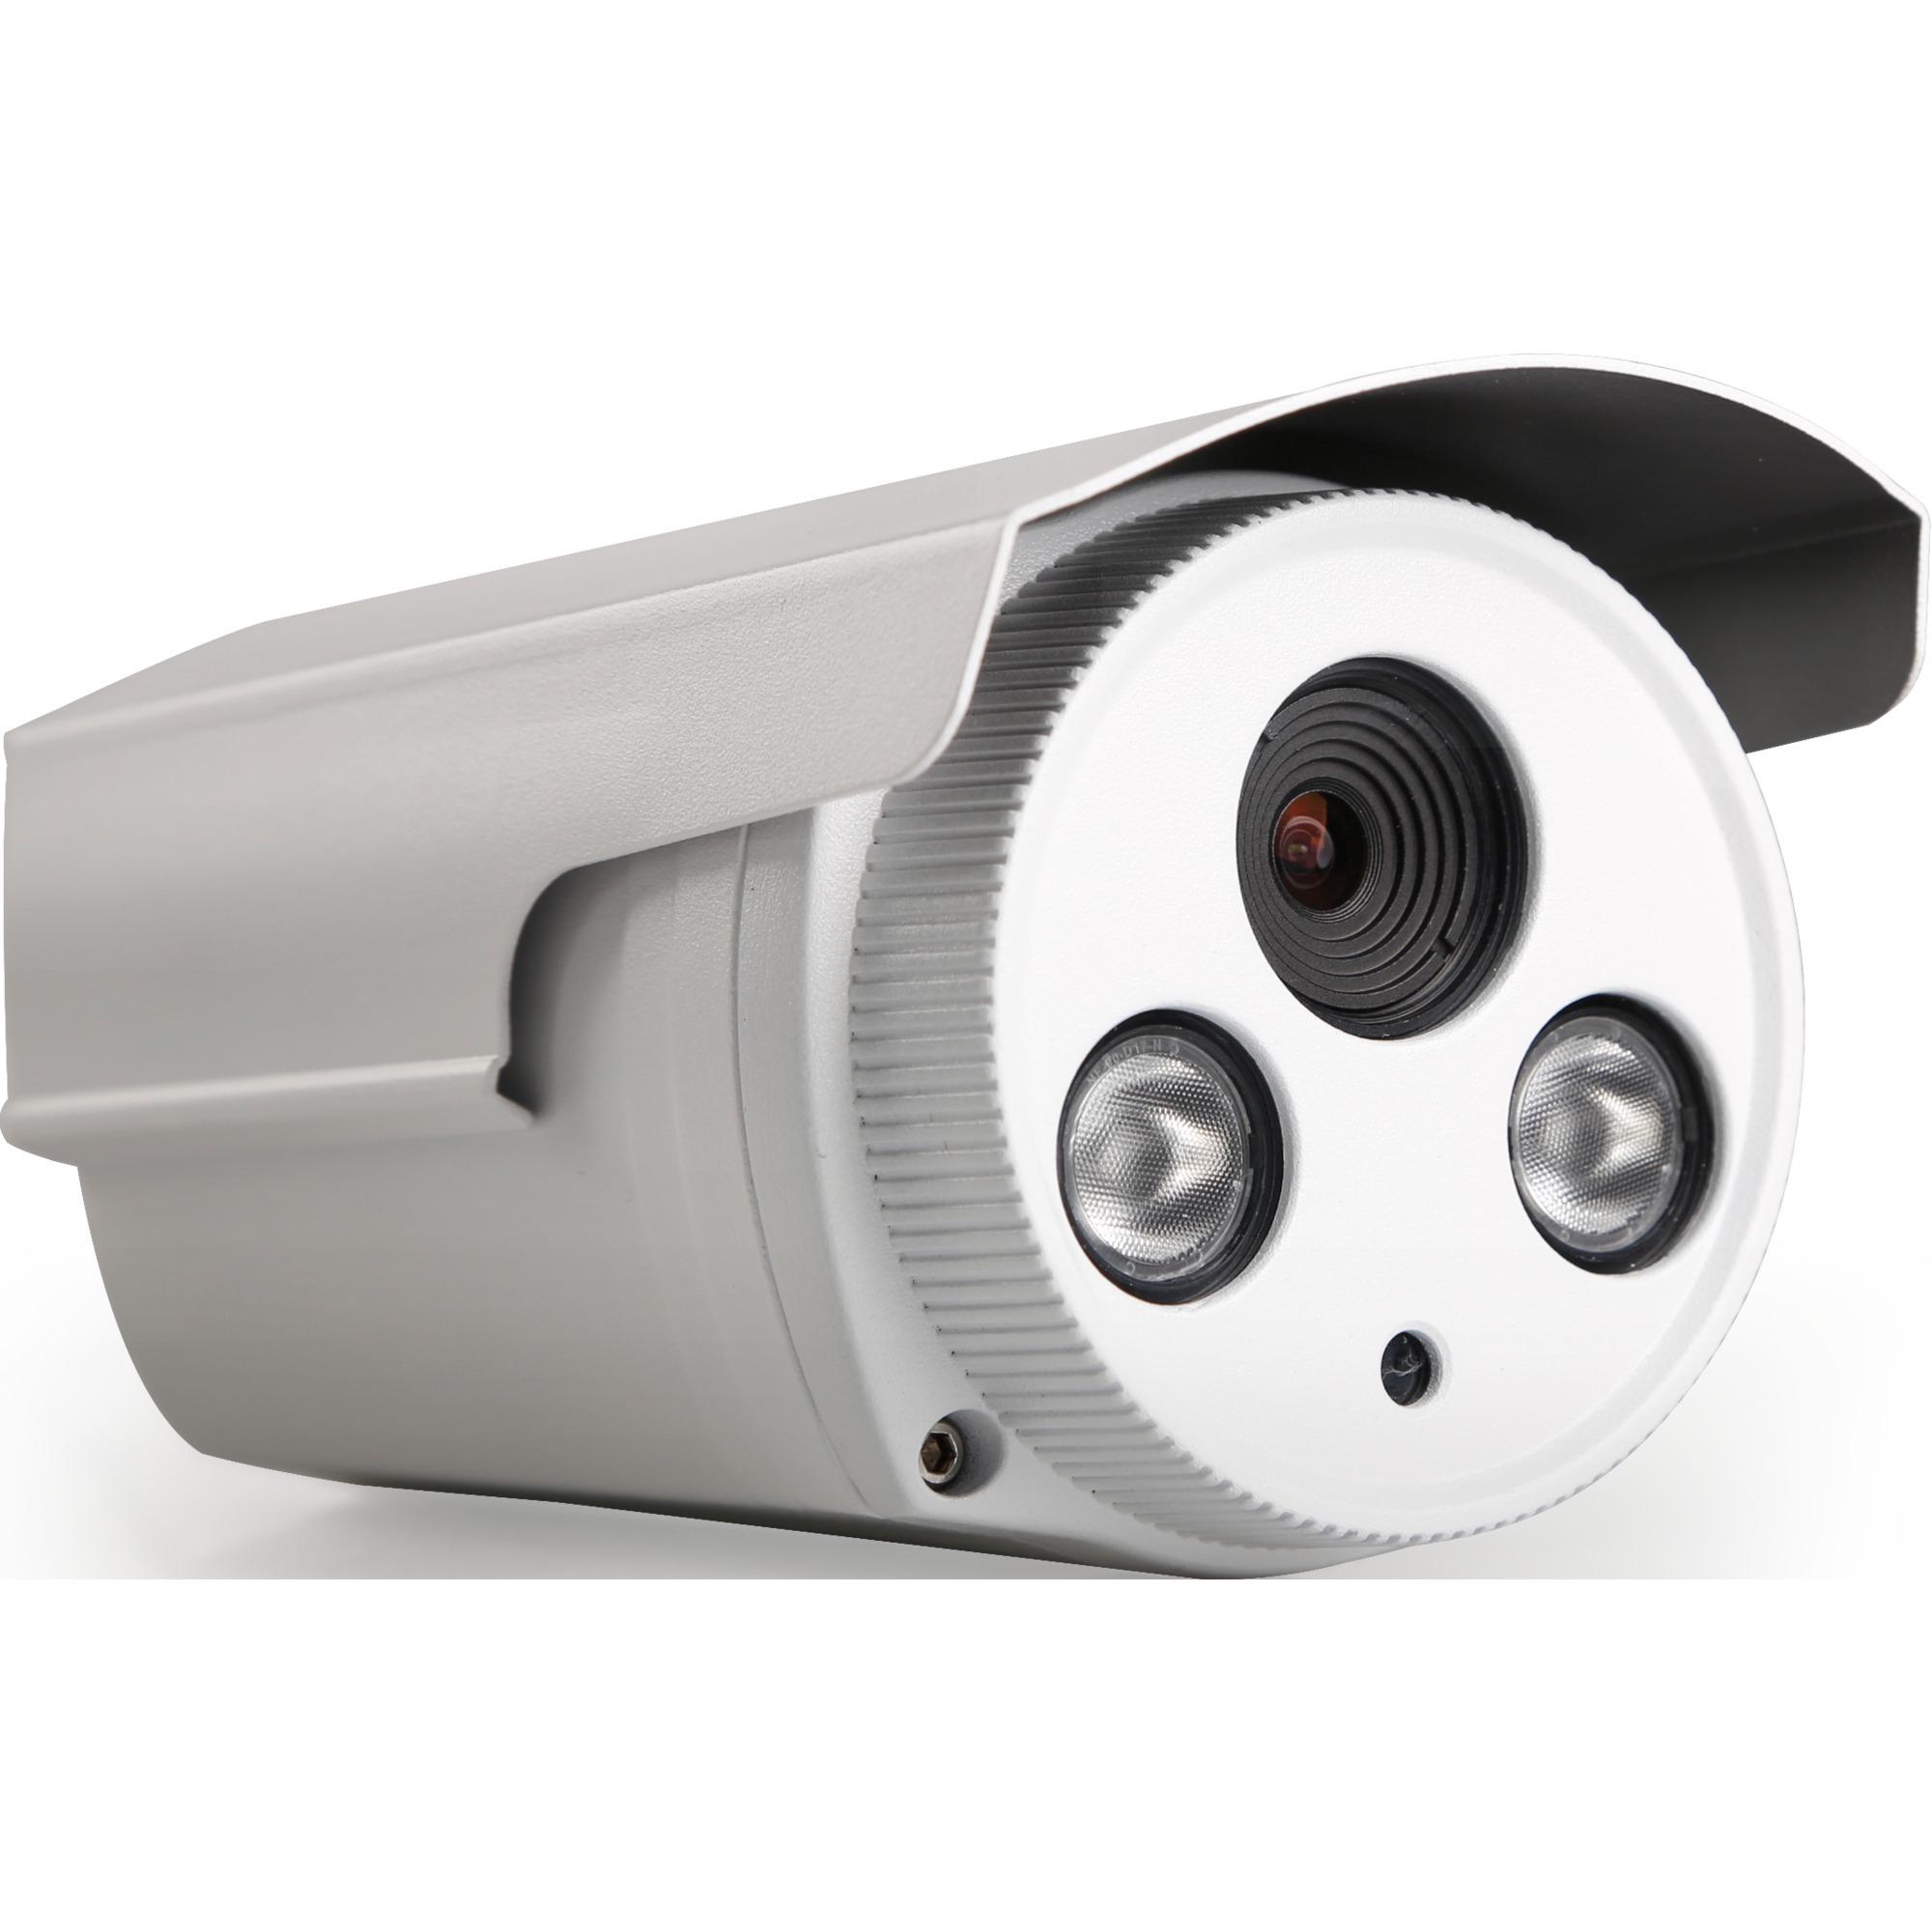 FI9903P IP security camera Intérieure et extérieure Cosse Blanc caméra de sécurité, Caméra de surveillance